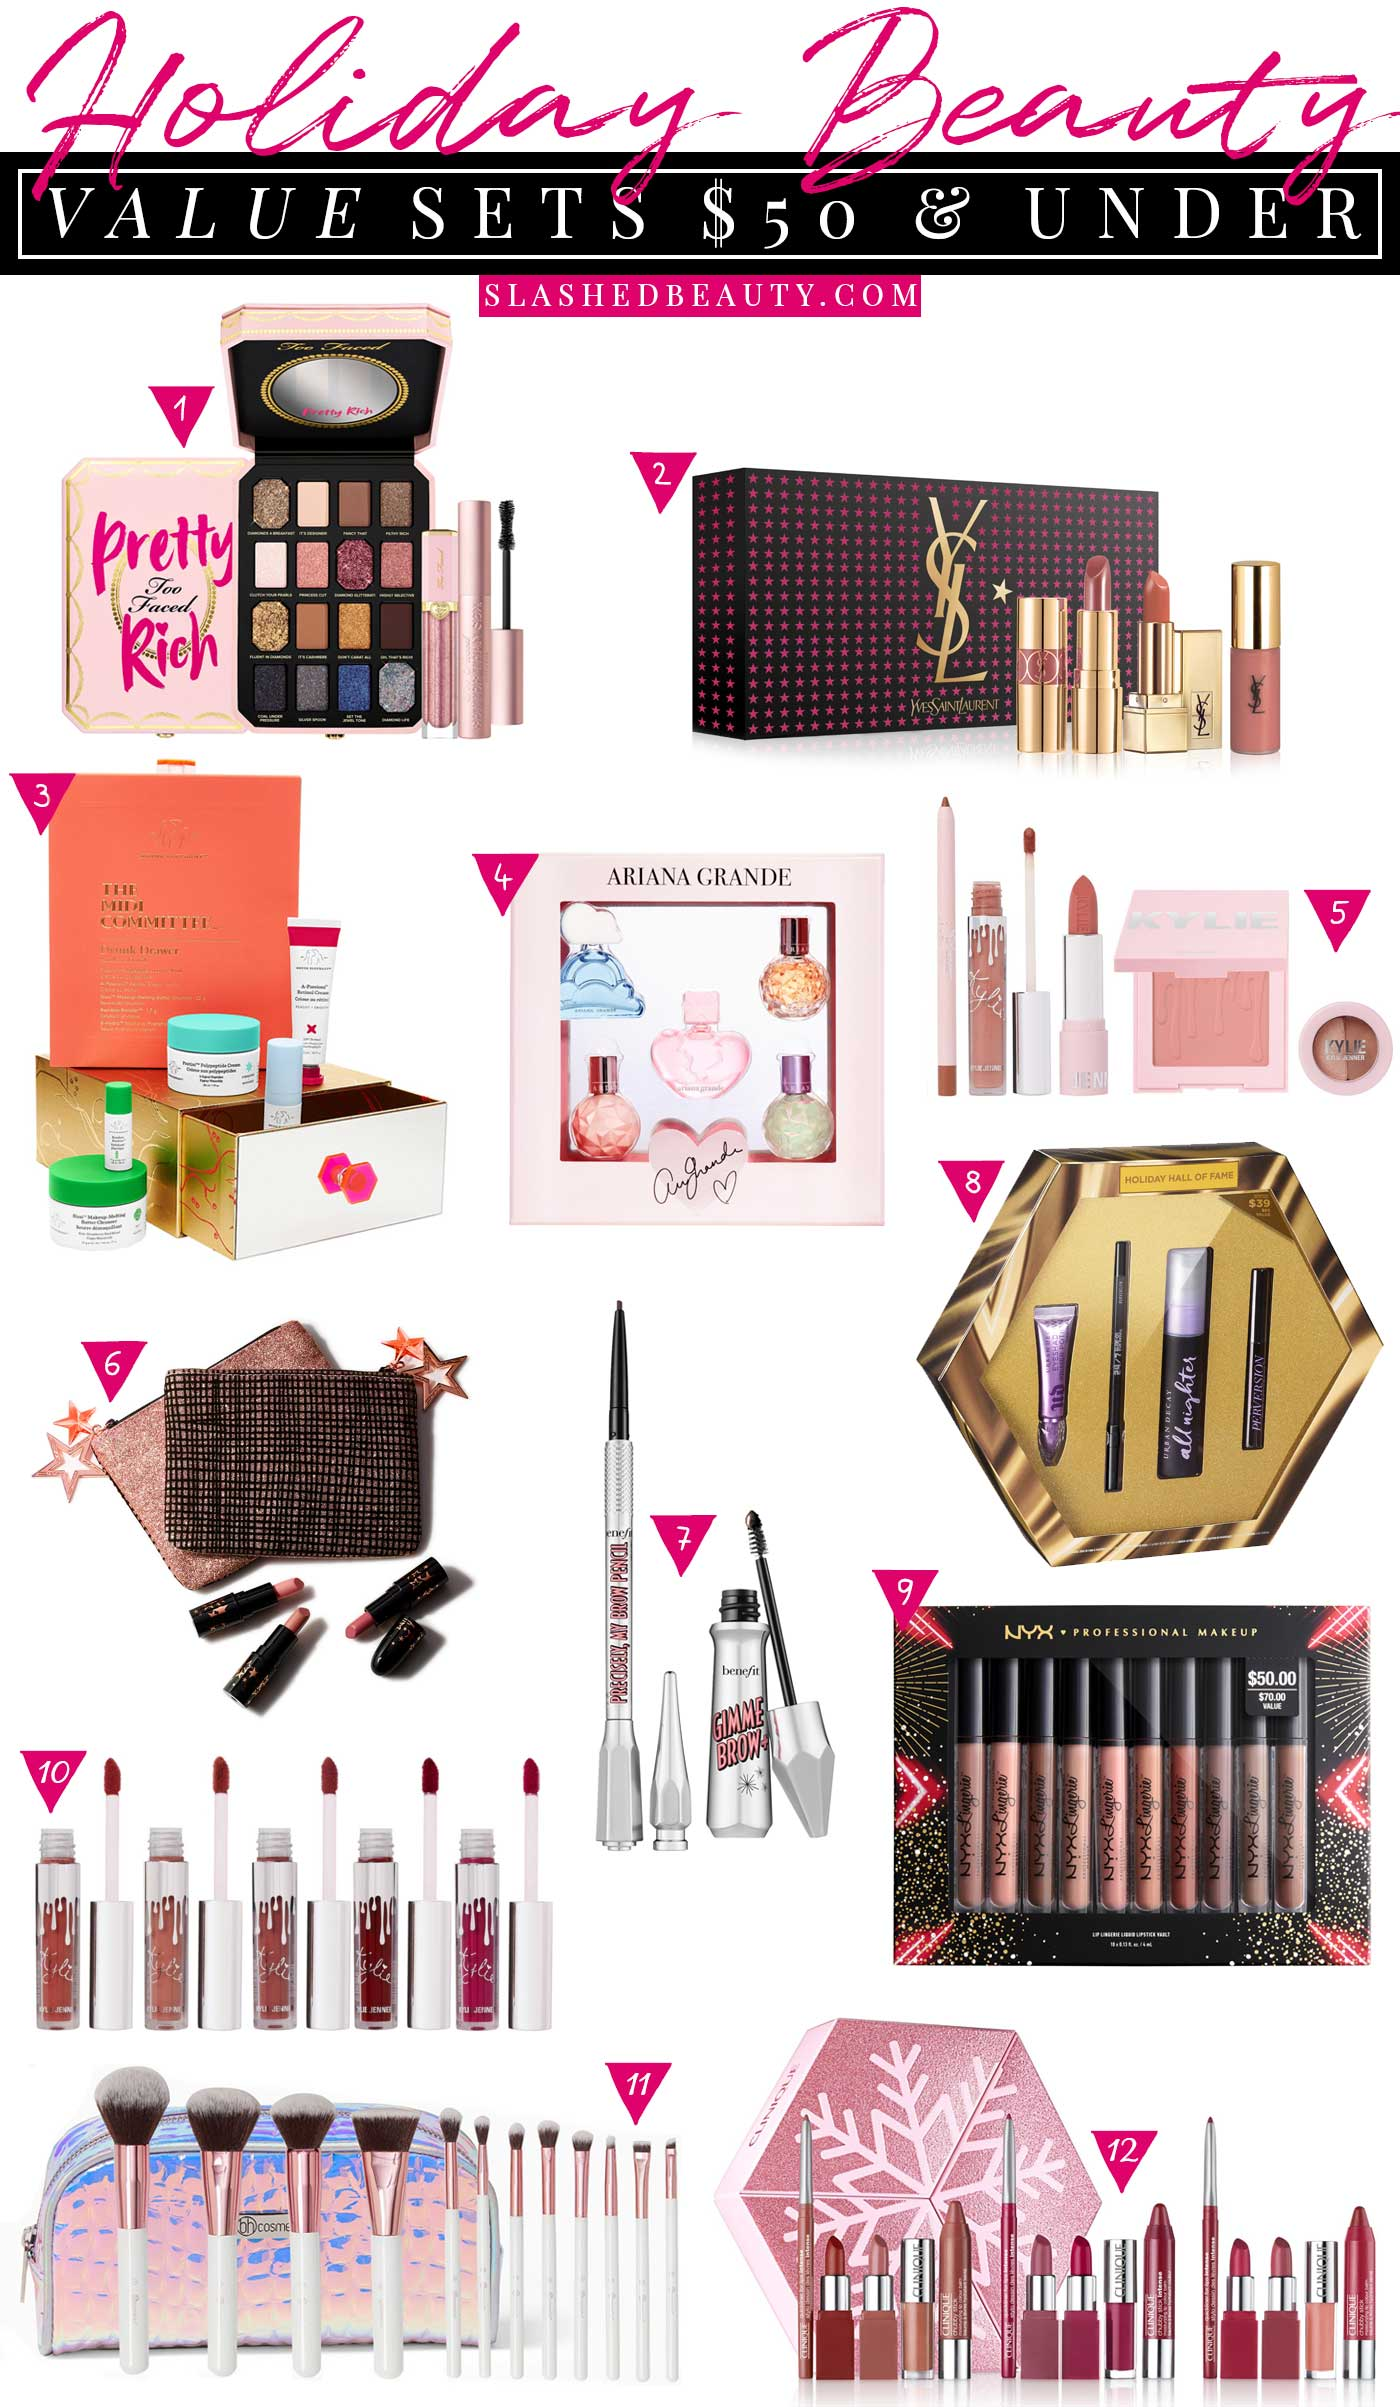 The Best Holiday Beauty Value Sets $50 & Under | Beauty Gift Ideas | Slashed Beauty